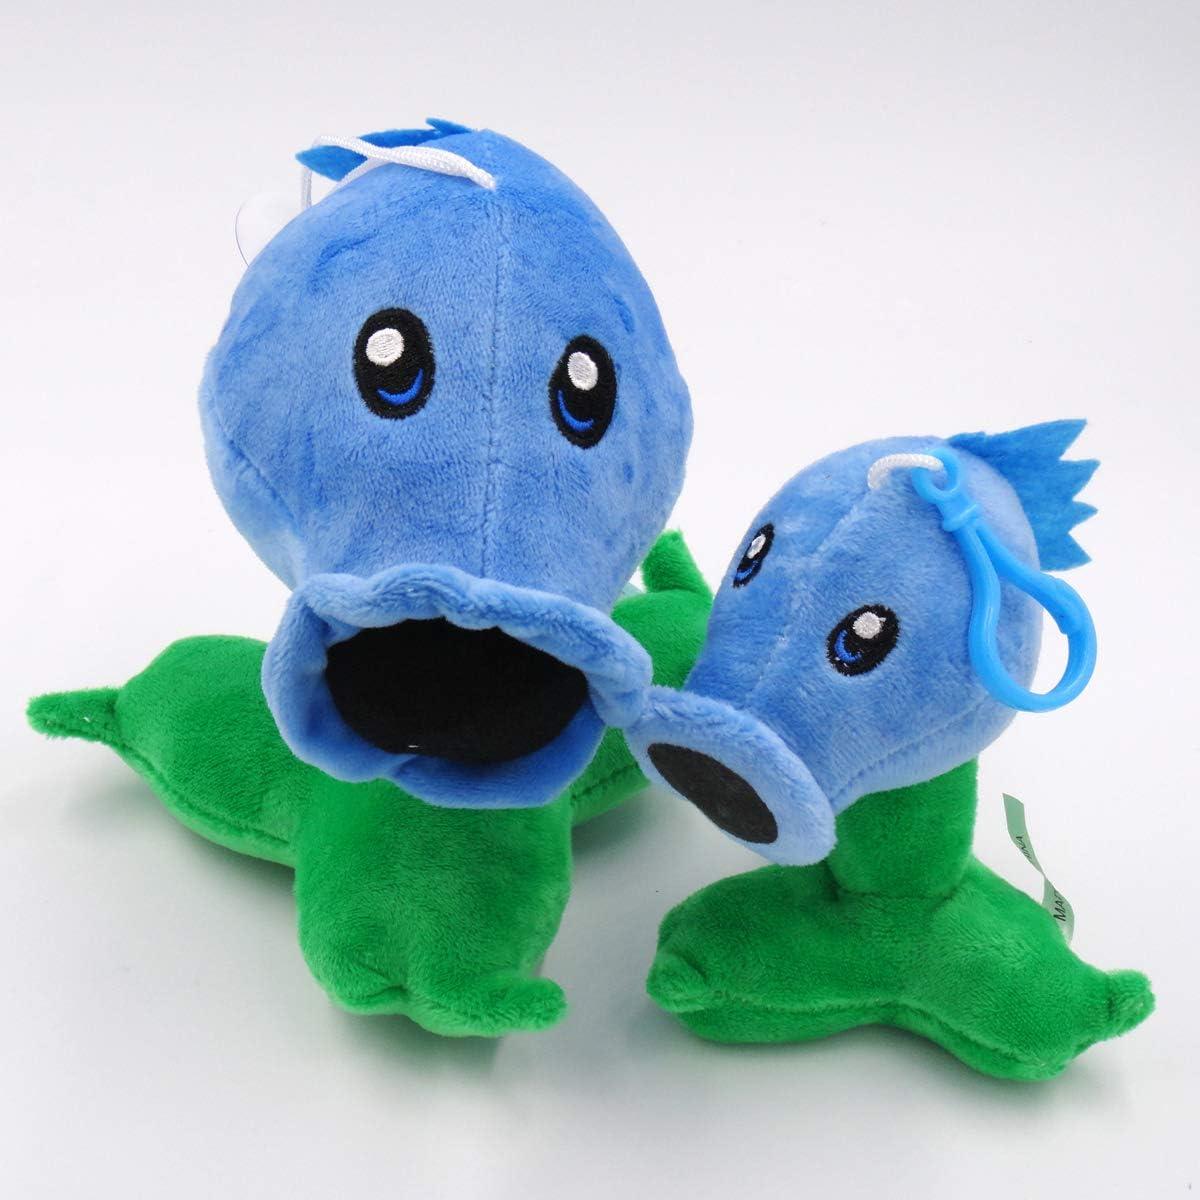 TavasHome Plants VS Zombies shipfree 2 PVZ Toys Plush Stuffed Large-scale sale Set Figures